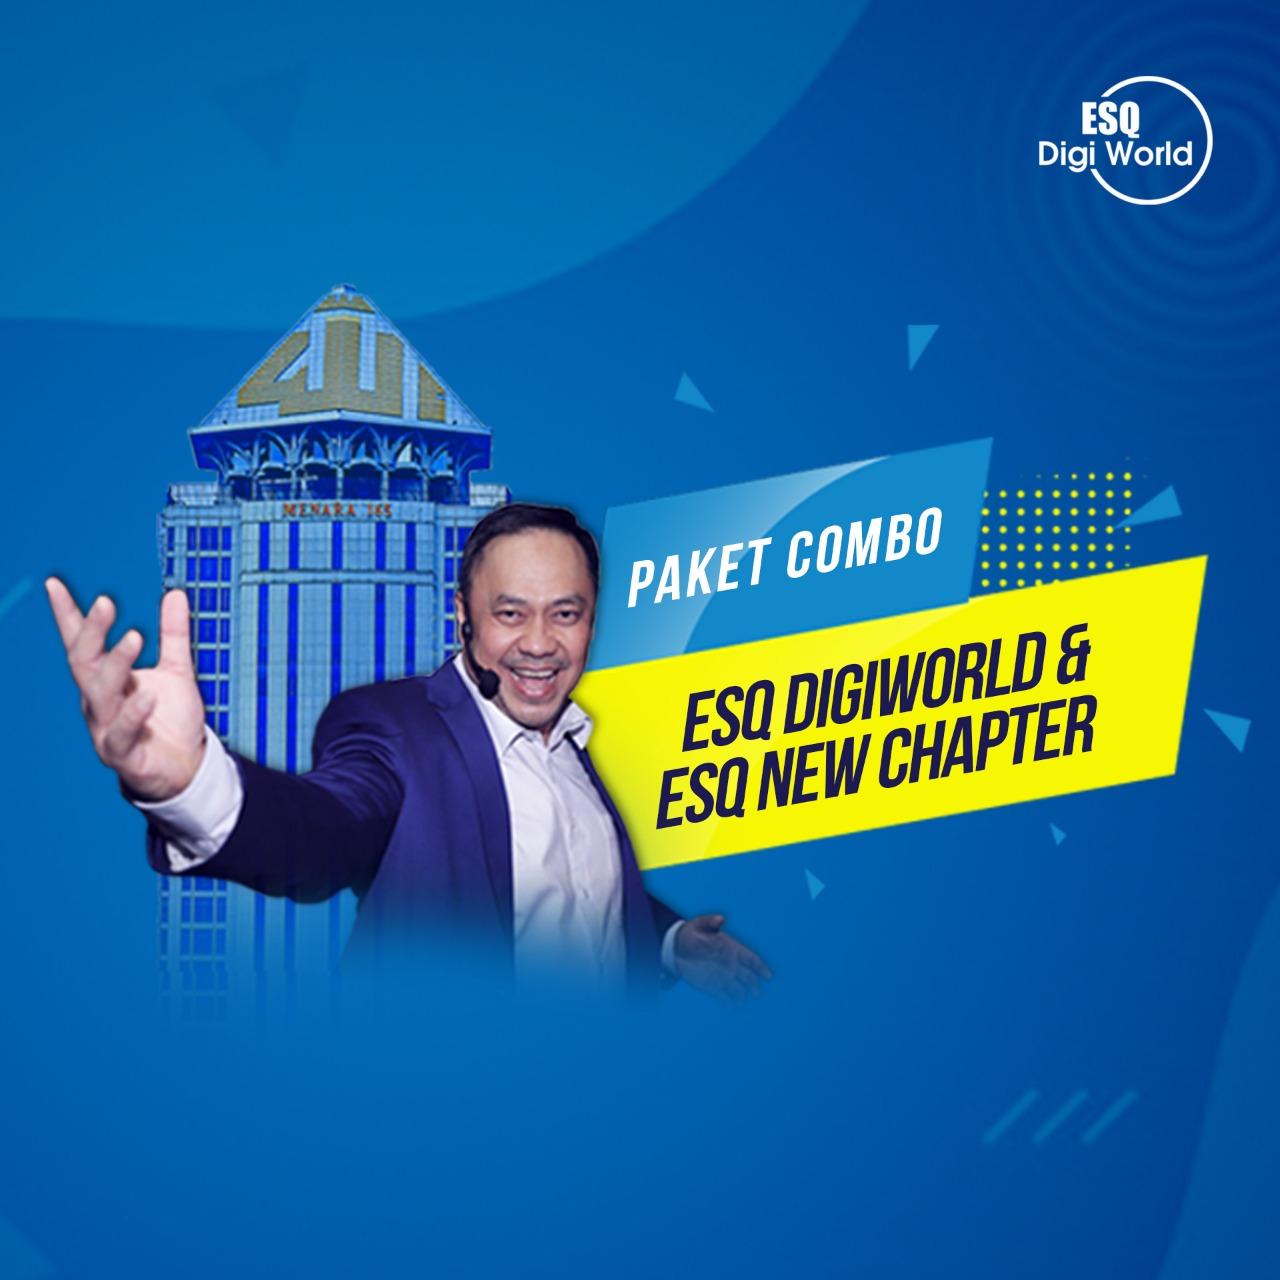 COMBO DIGI WORLD & ESQ NEW CHAPTER